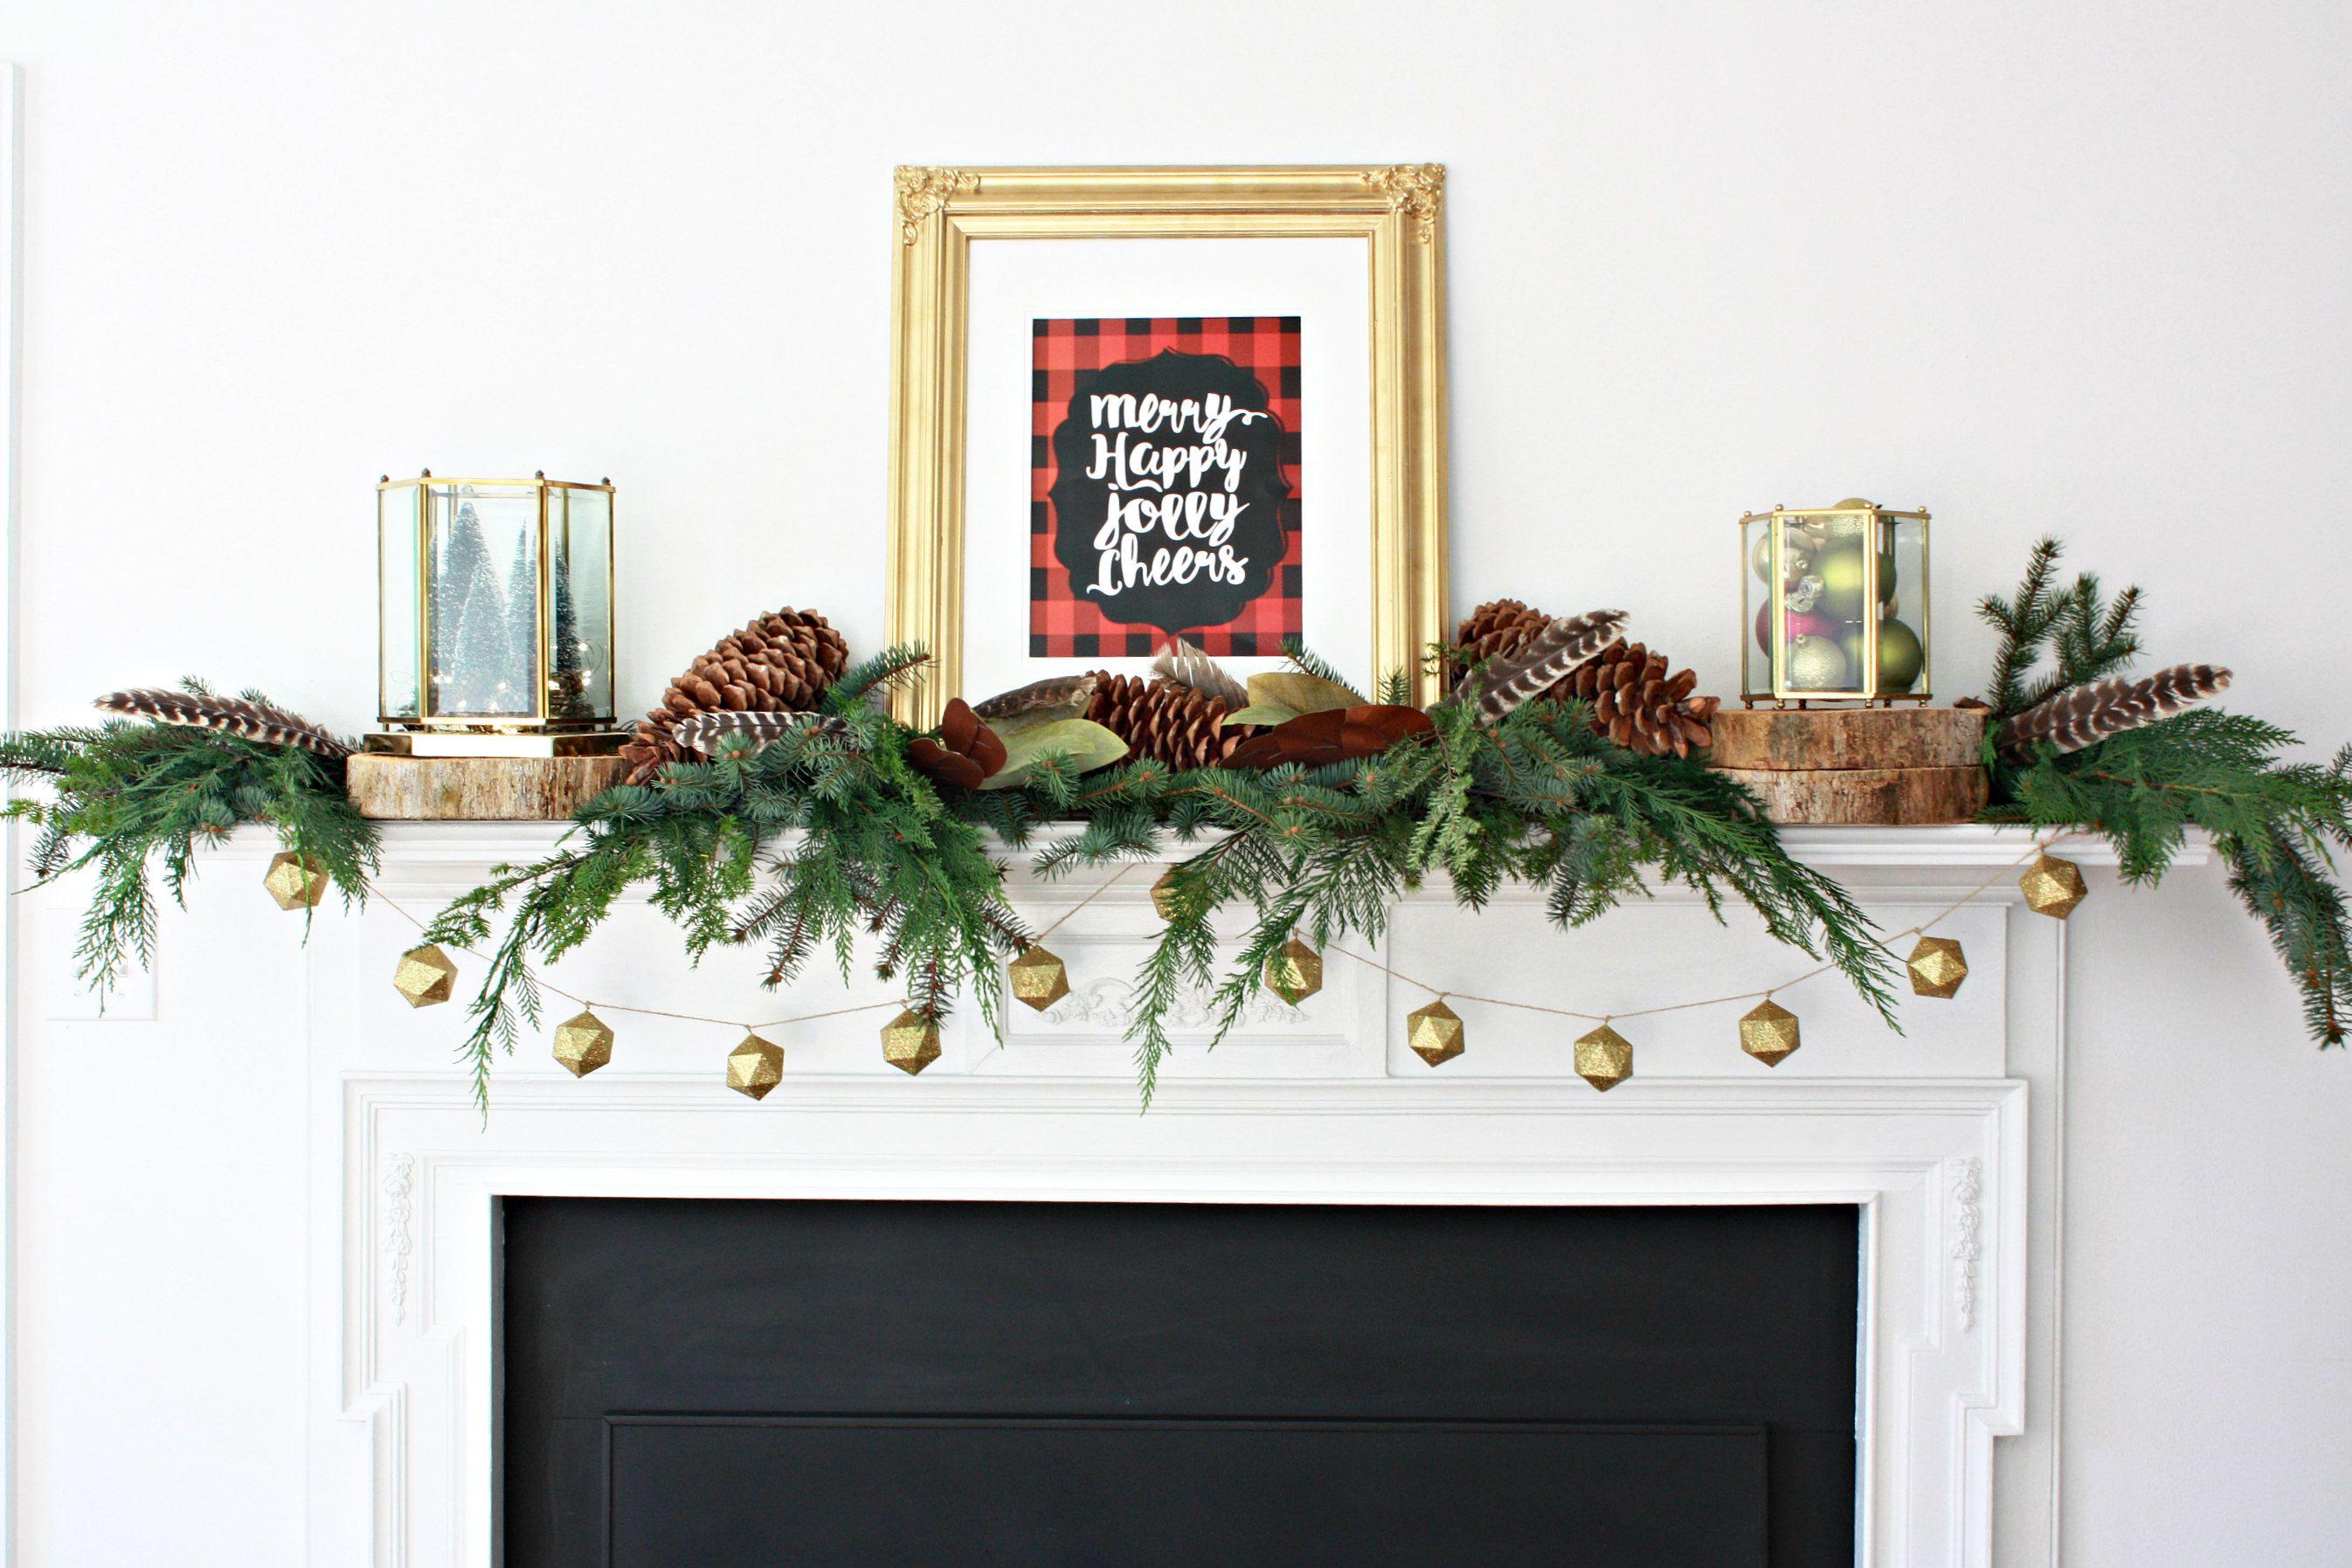 Design Christmas Mantel 34 easy and elegant christmas mantel ideas